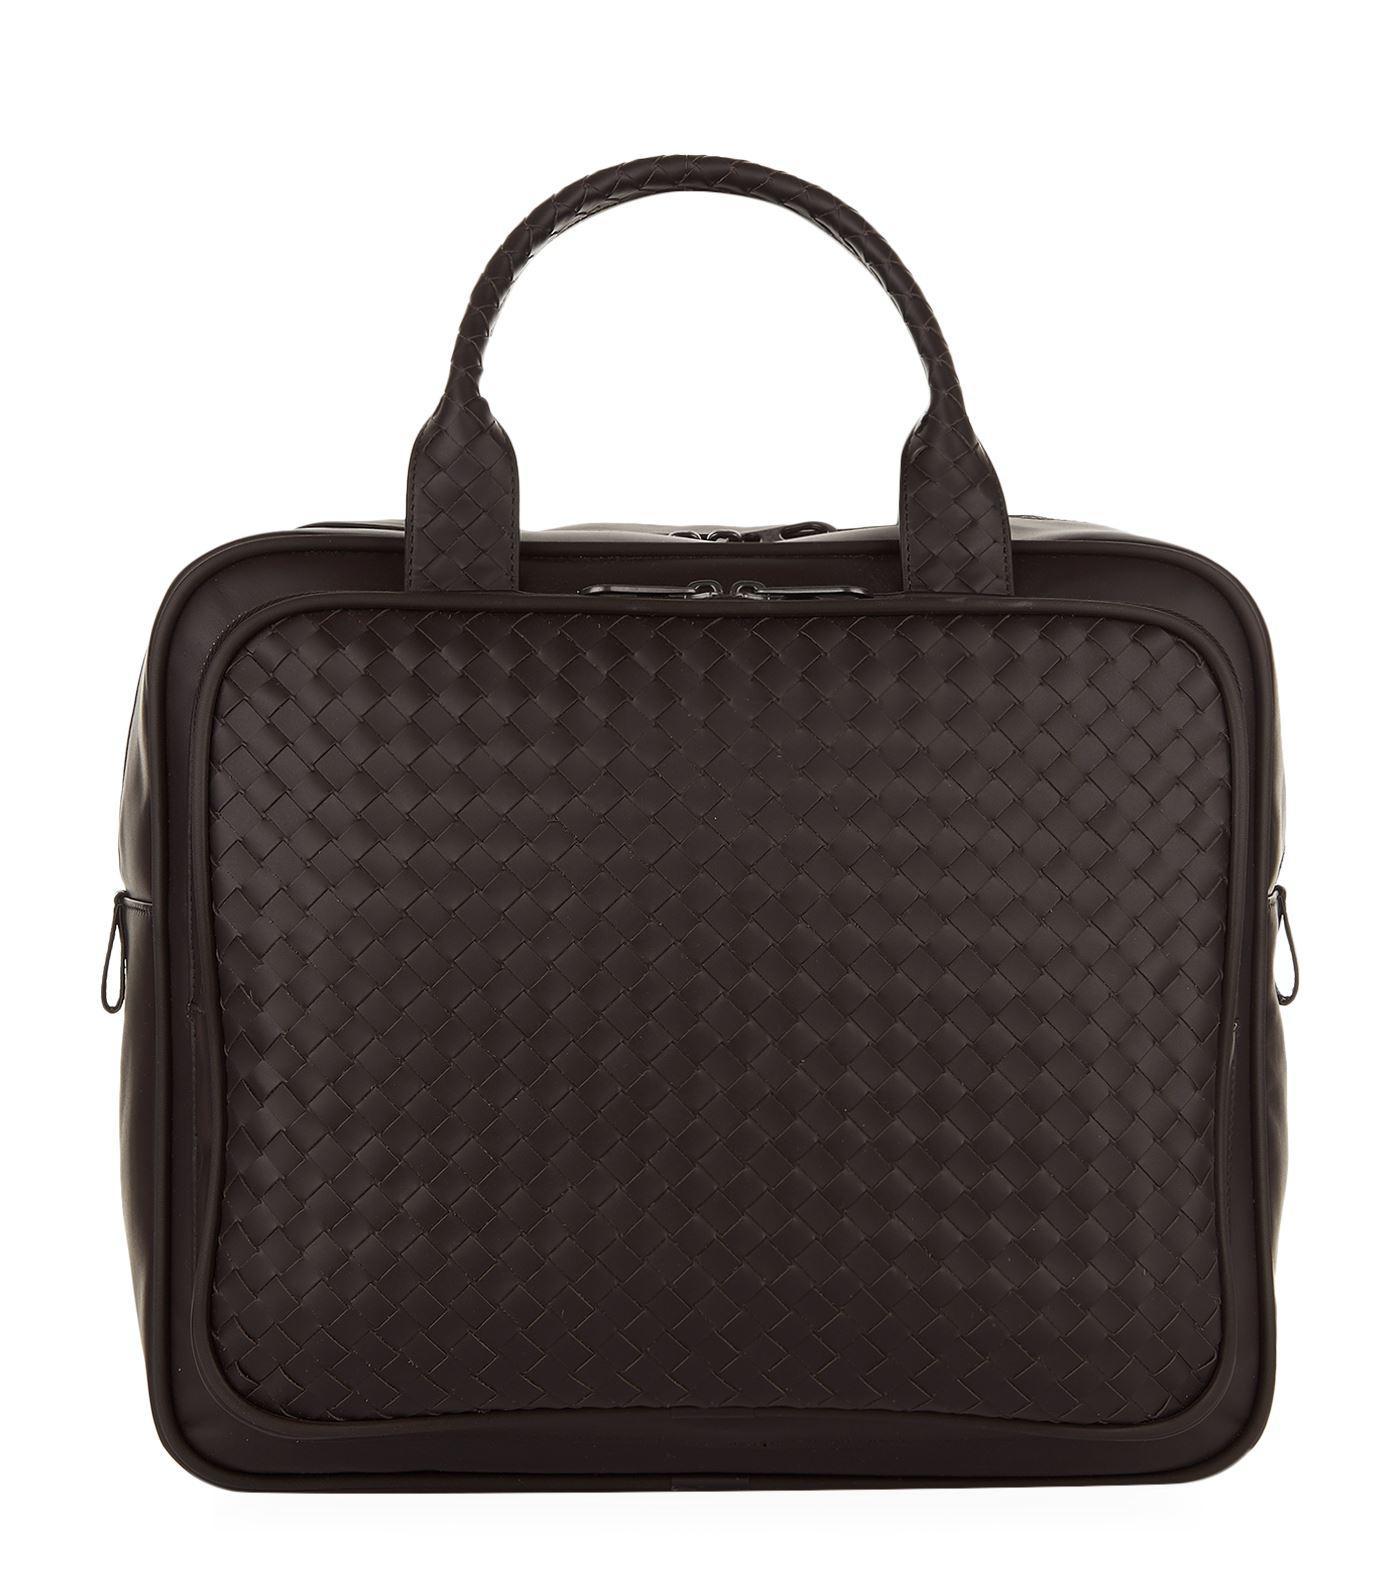 d934dfbadab4 Bottega Veneta Intrecciato Leather Briefcase in Brown for Men - Lyst